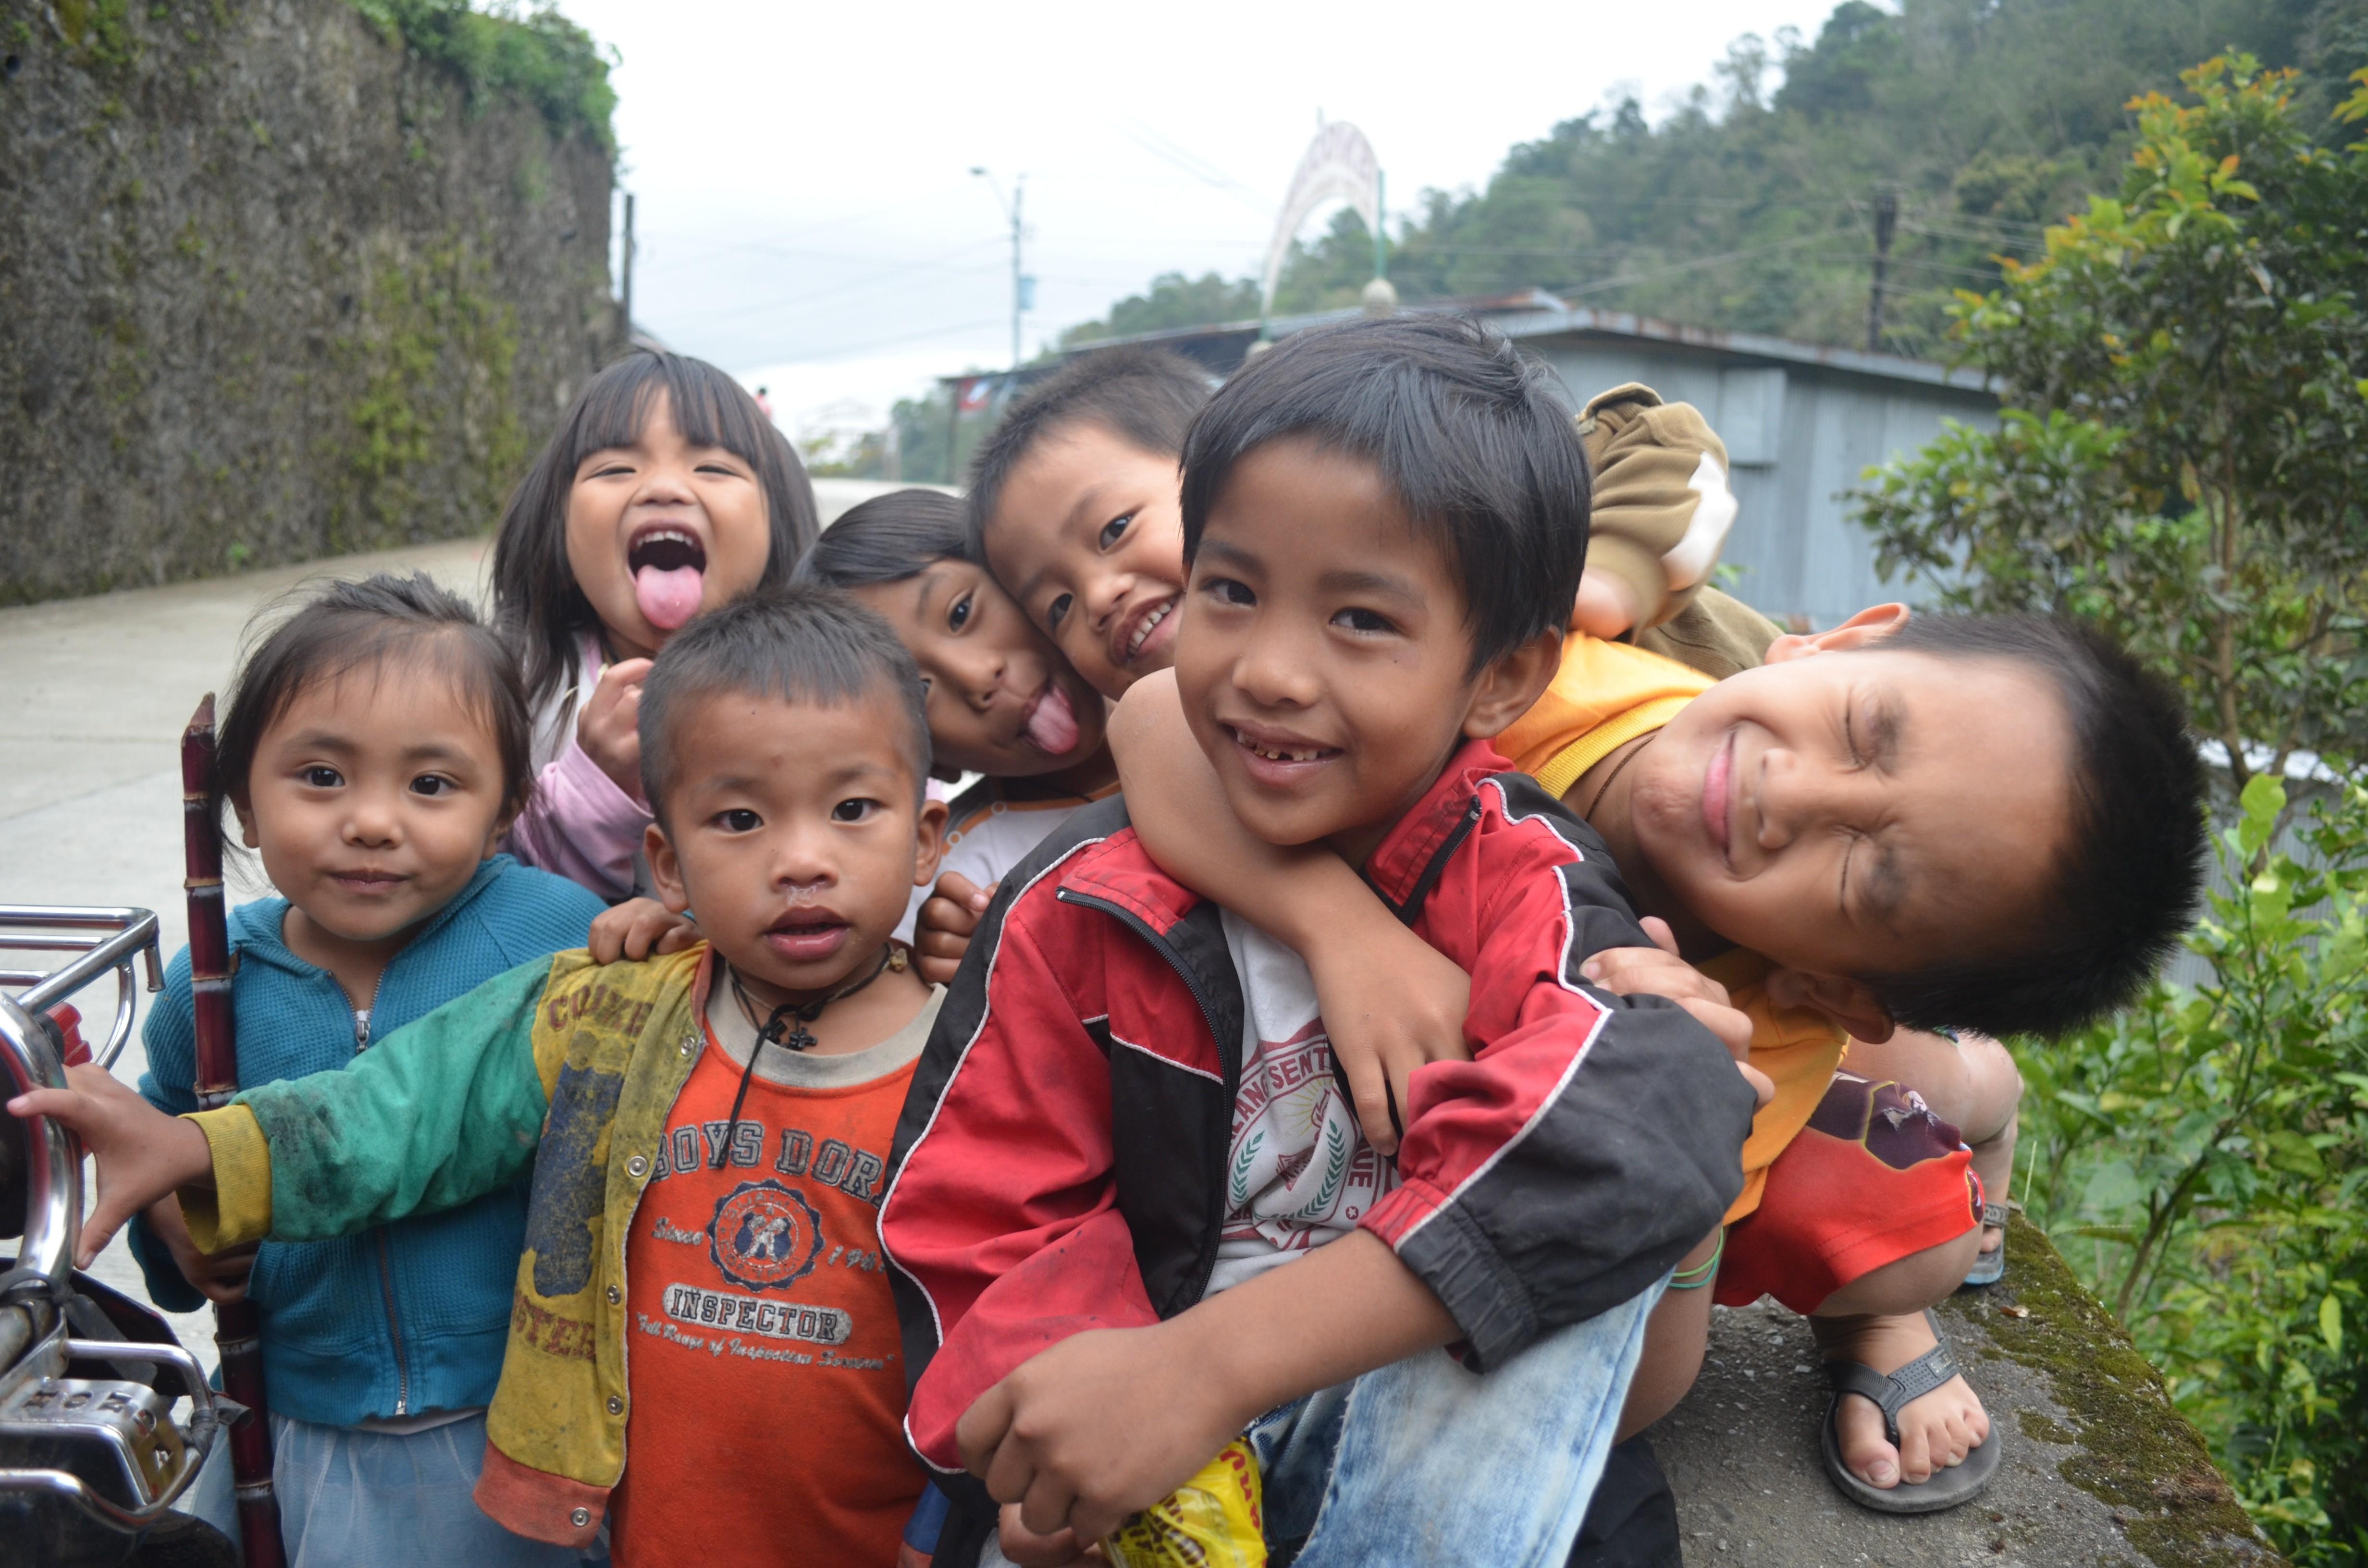 filipino kids - photo #26